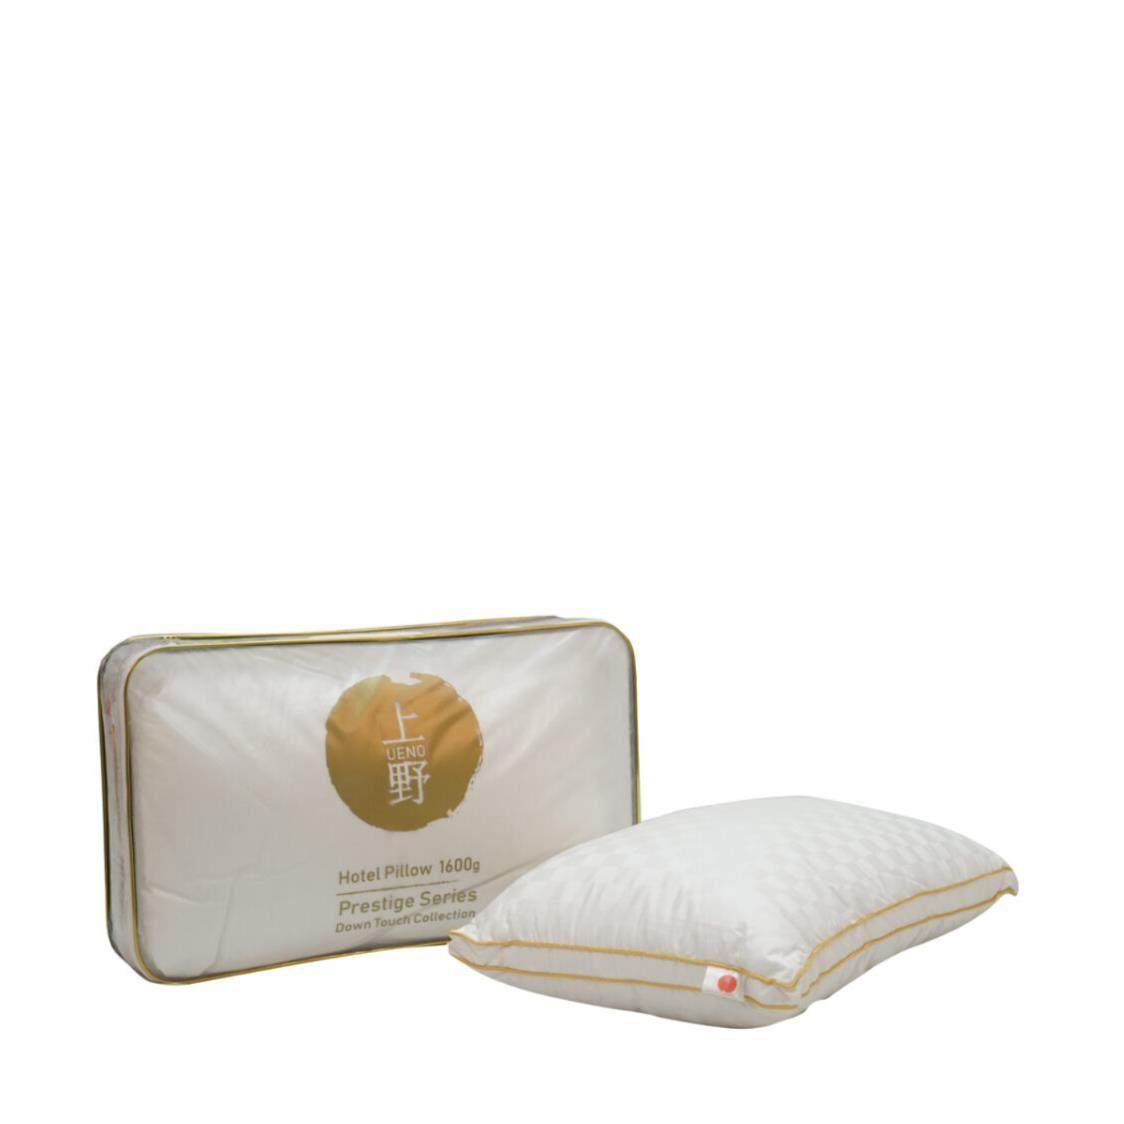 Ueno Prestige series Down Touch 1600g Pillow